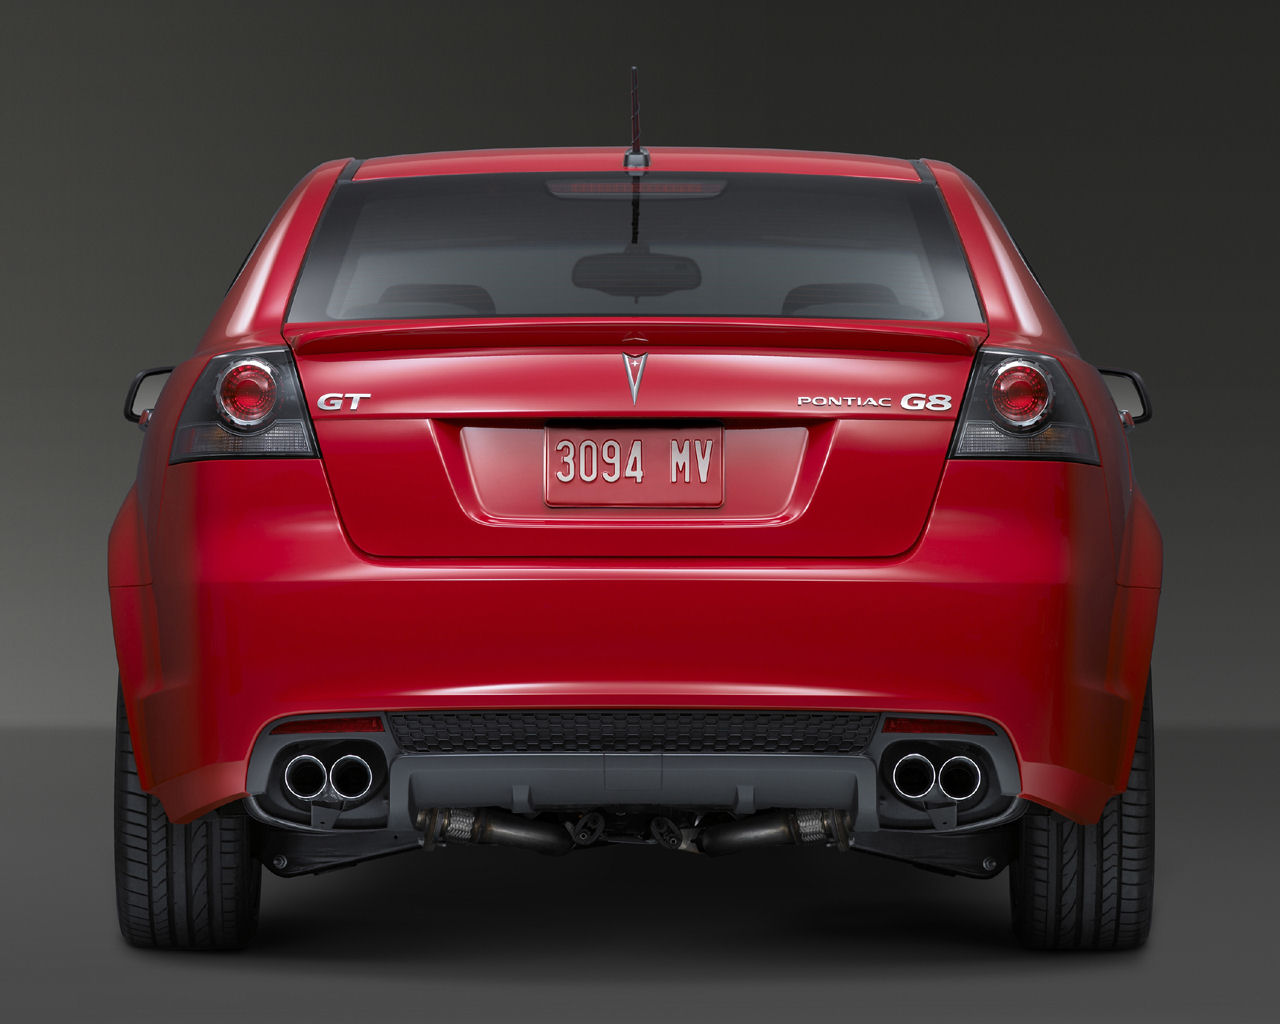 Pontiac G8 V6 Gt V8 Gxp Sedan Free 1280x1024 Wallpaper